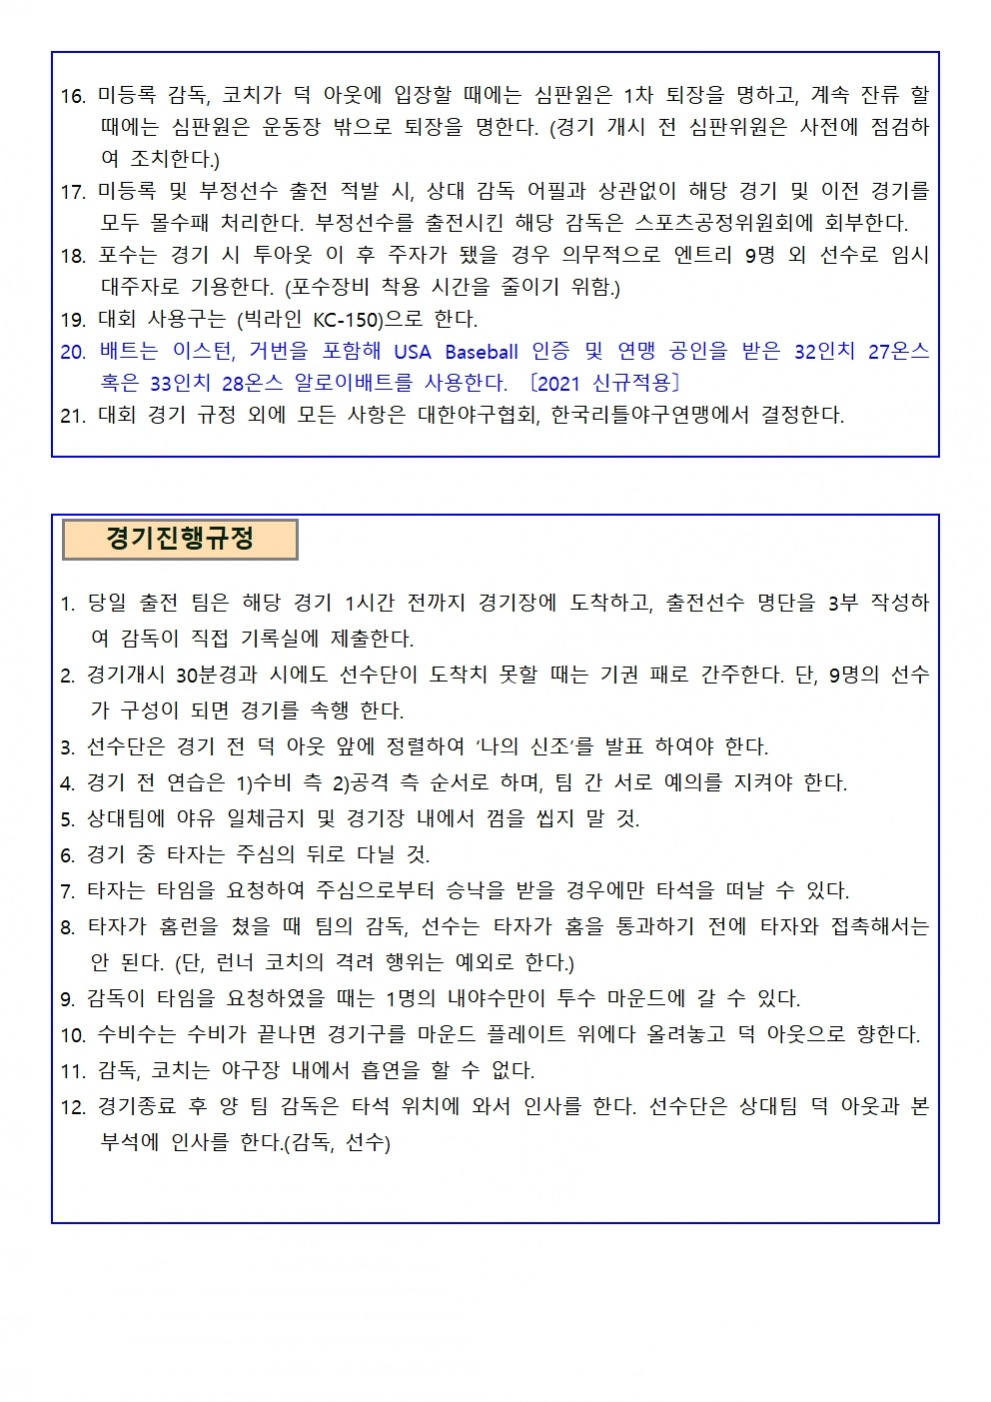 2021 U-15 주니어부 경기규정002.jpg